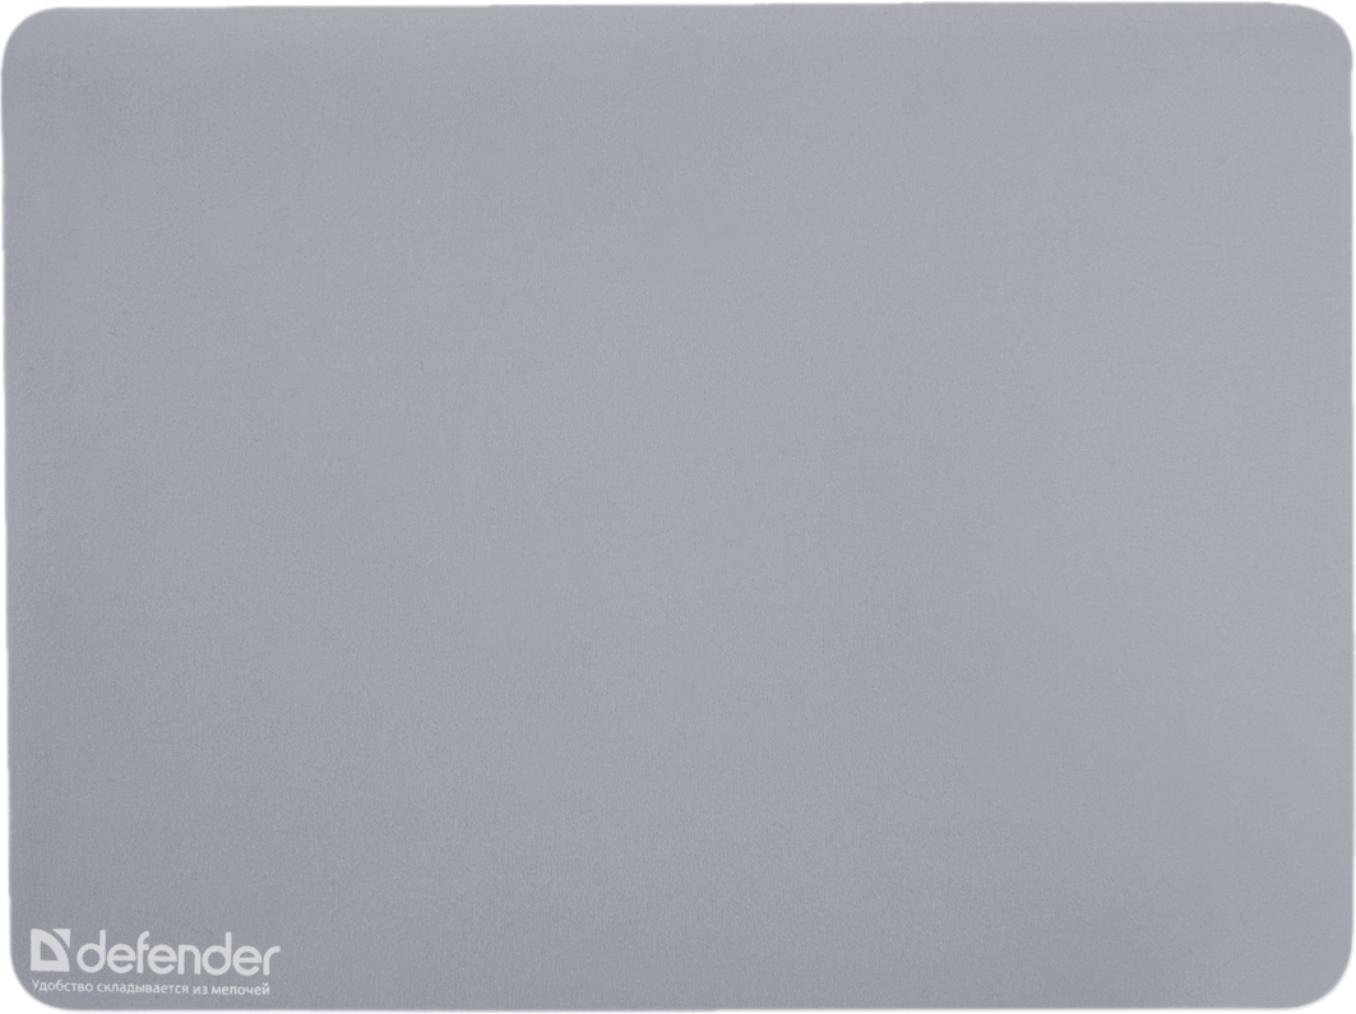 Коврик для компьютерной мыши Notebook Microfiber, 300х225х1.2мм., асорти, ассорт. Defender - фото 2